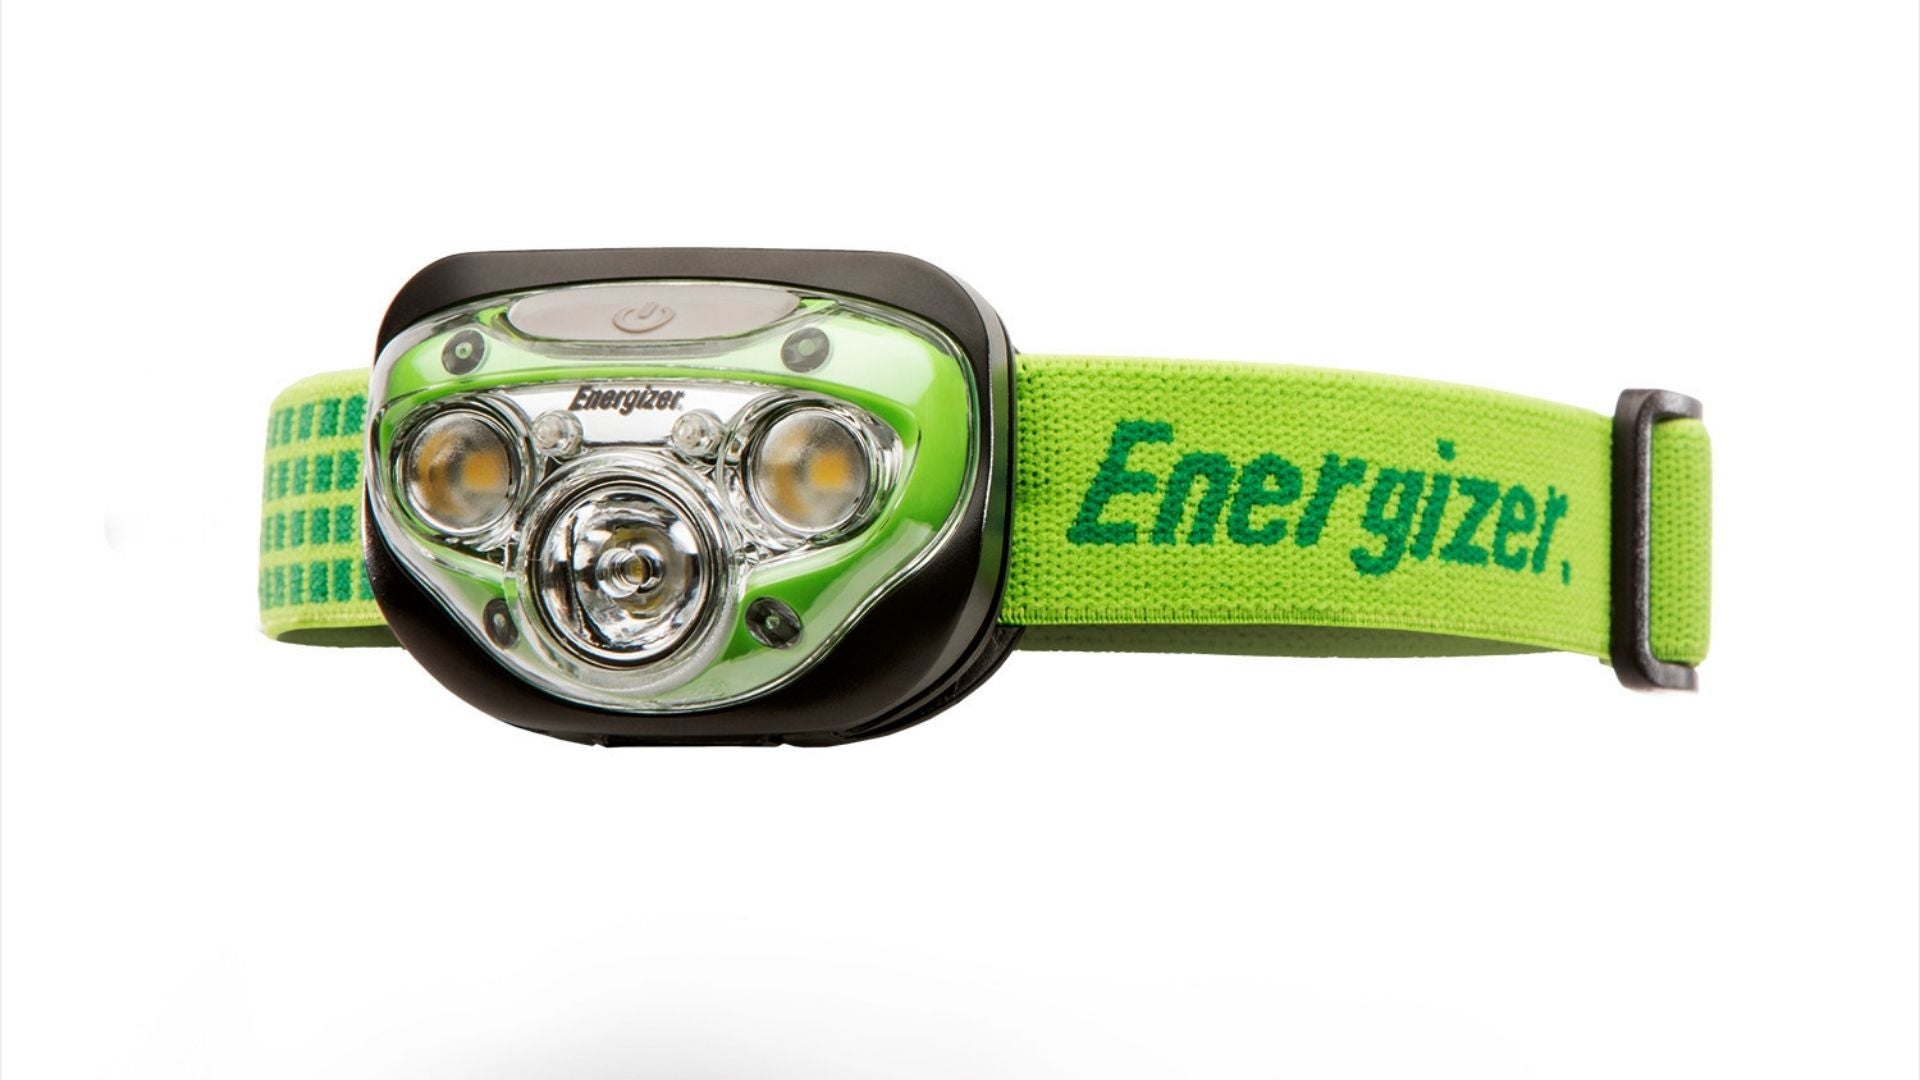 Energizer Vision HD+ 350 Lumen LED Headlamp